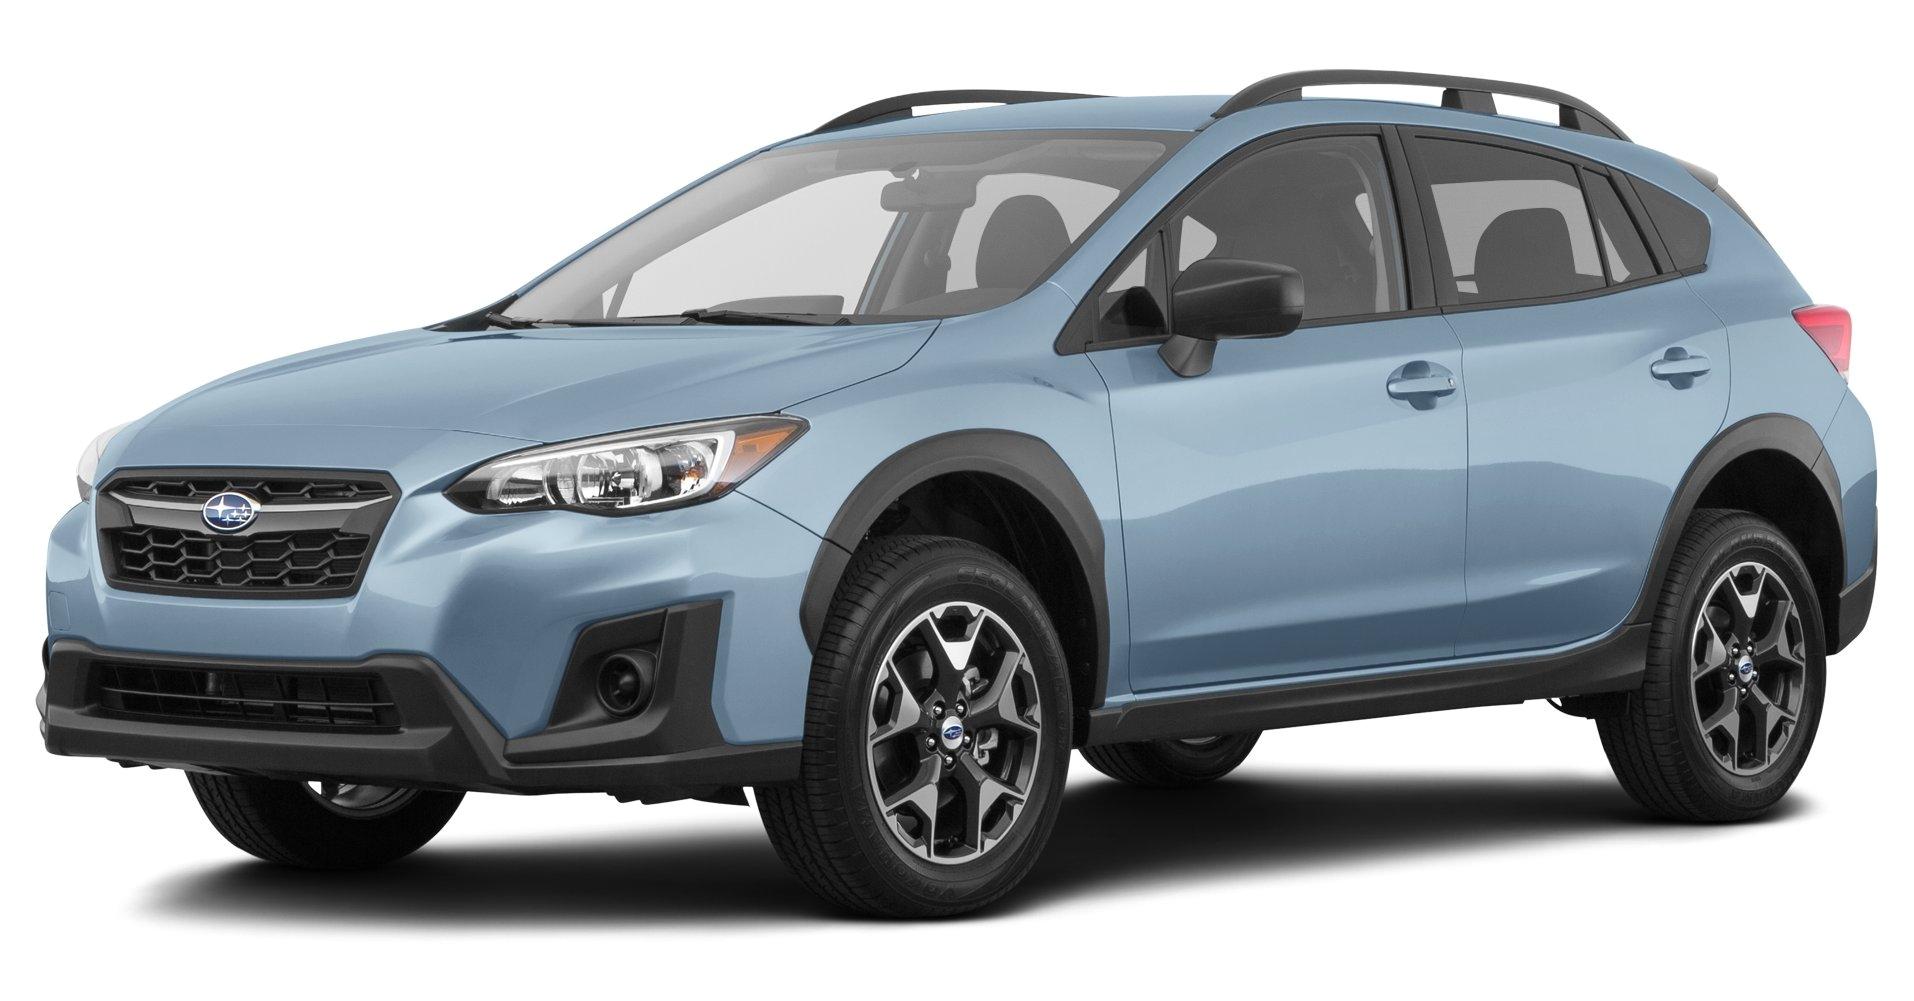 Best Bike Rack for Subaru Crosstrek 2017 Amazon Com 2018 Subaru Crosstrek Reviews Images and Specs Vehicles